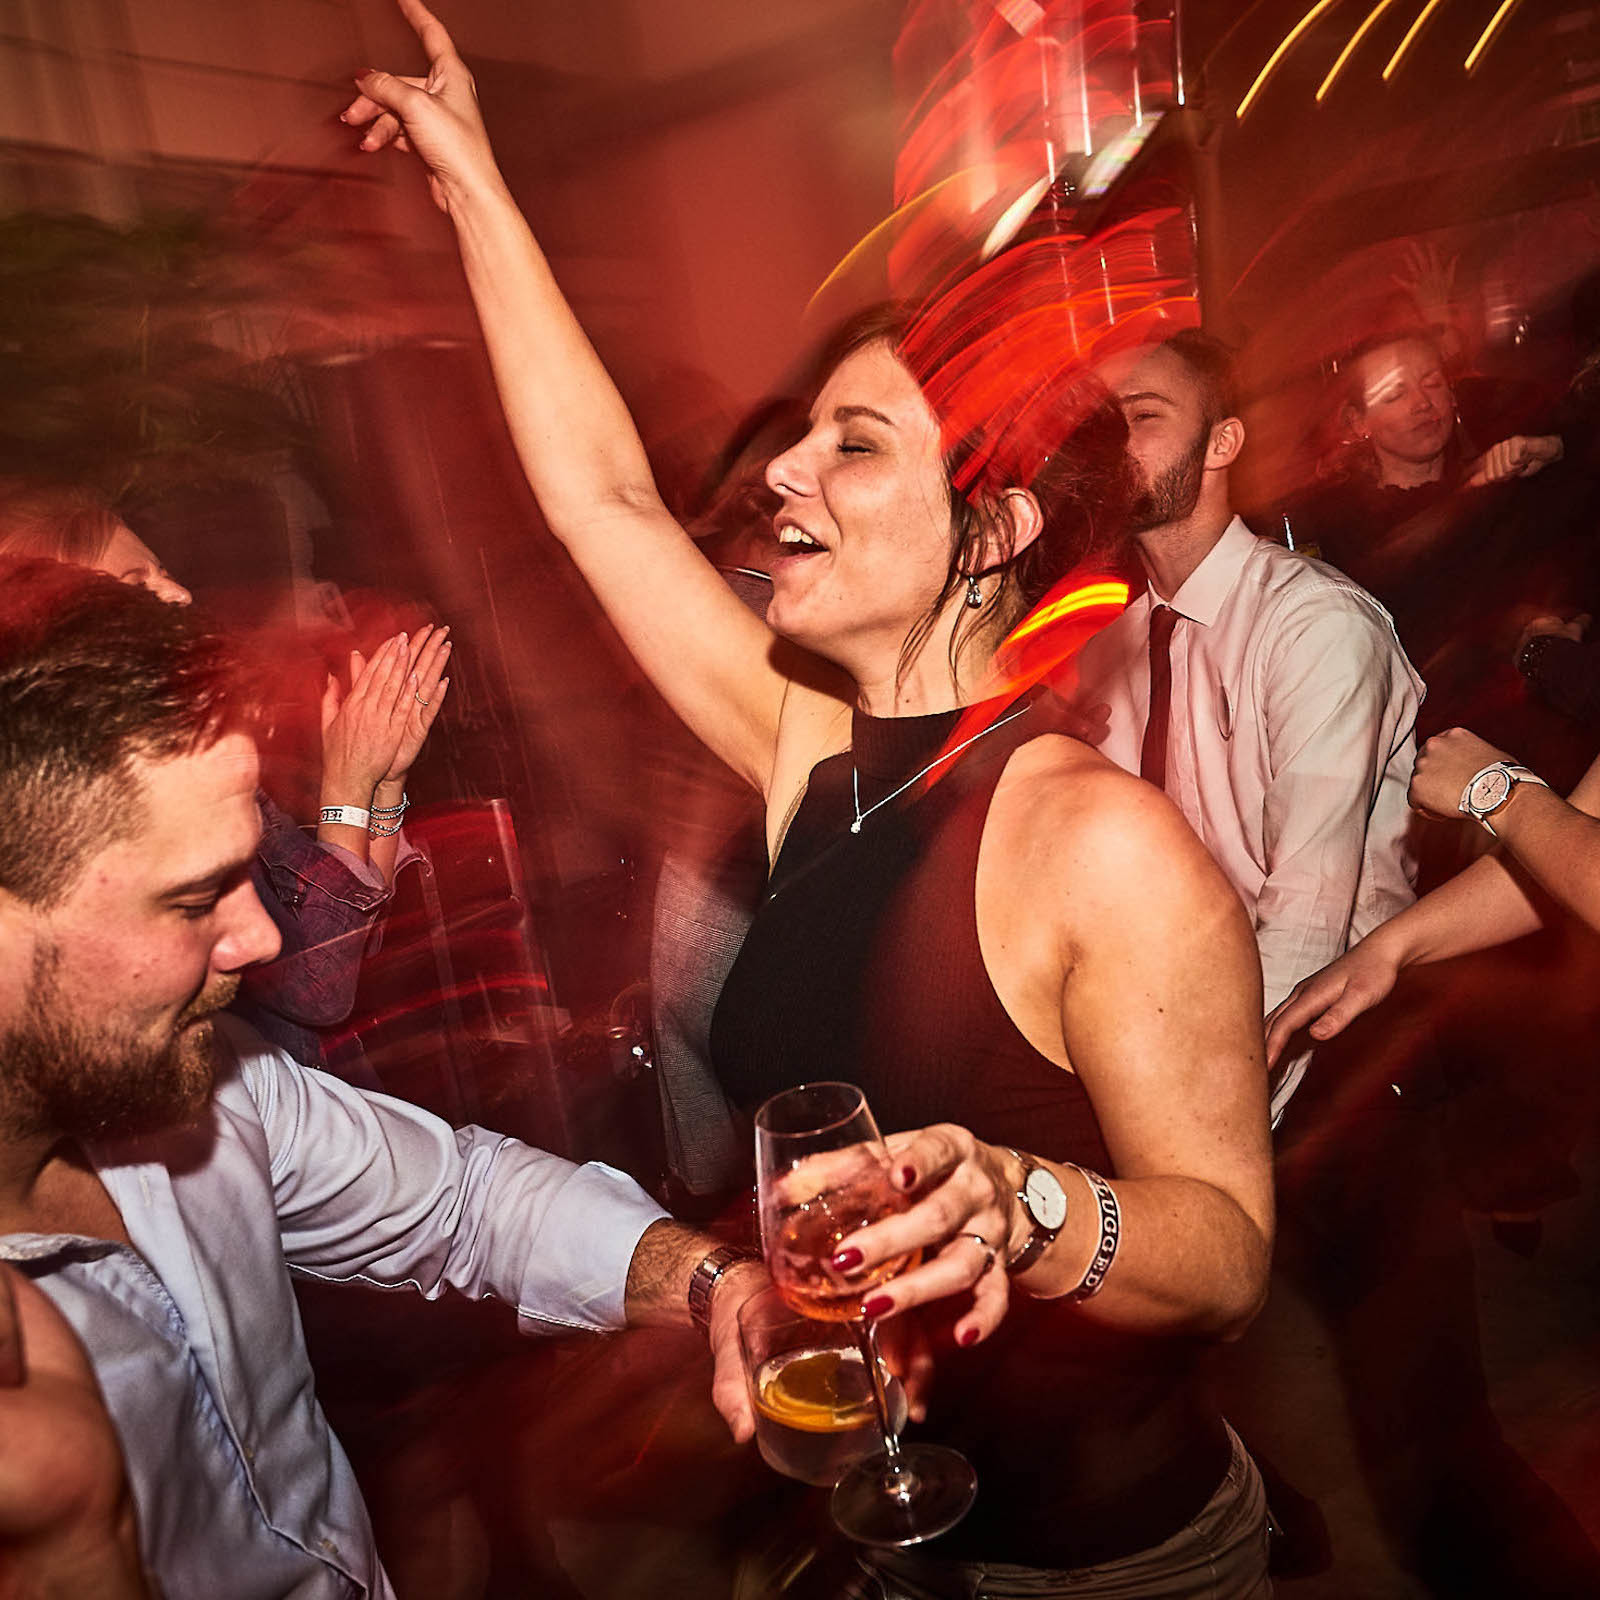 DJane | DJ | Hannover | Gliterplatte | Club | Wedding | Electro | Hip | Hop | Lounge | Empfang | Event | Messe | Charity | Gala | Buchen | Mieten